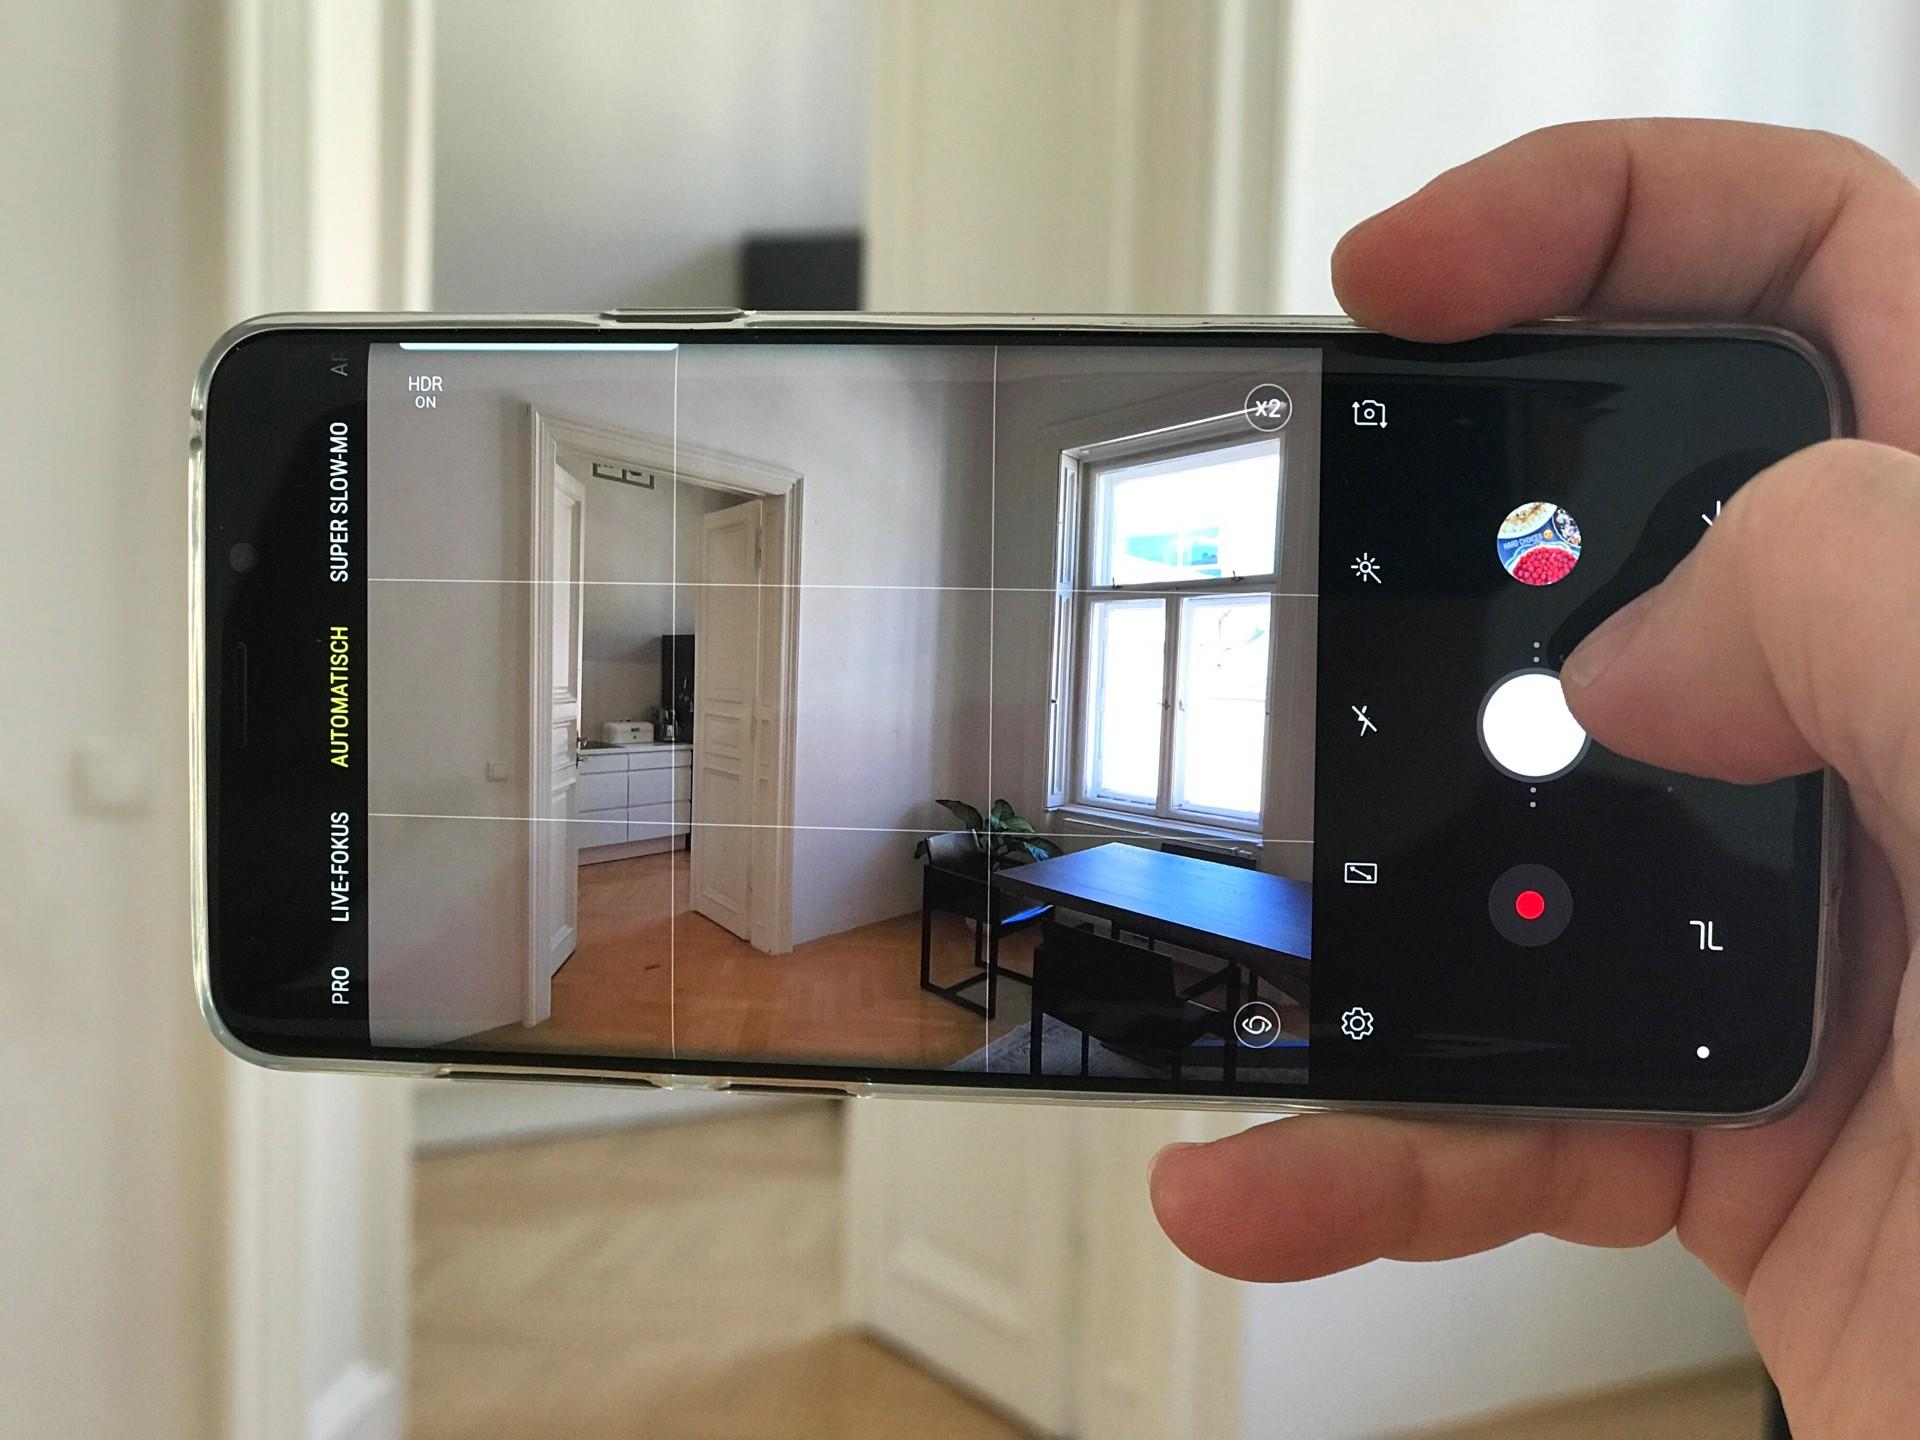 Top Samsung Galaxy S9 Camera Tips and Tricks - The Vienna